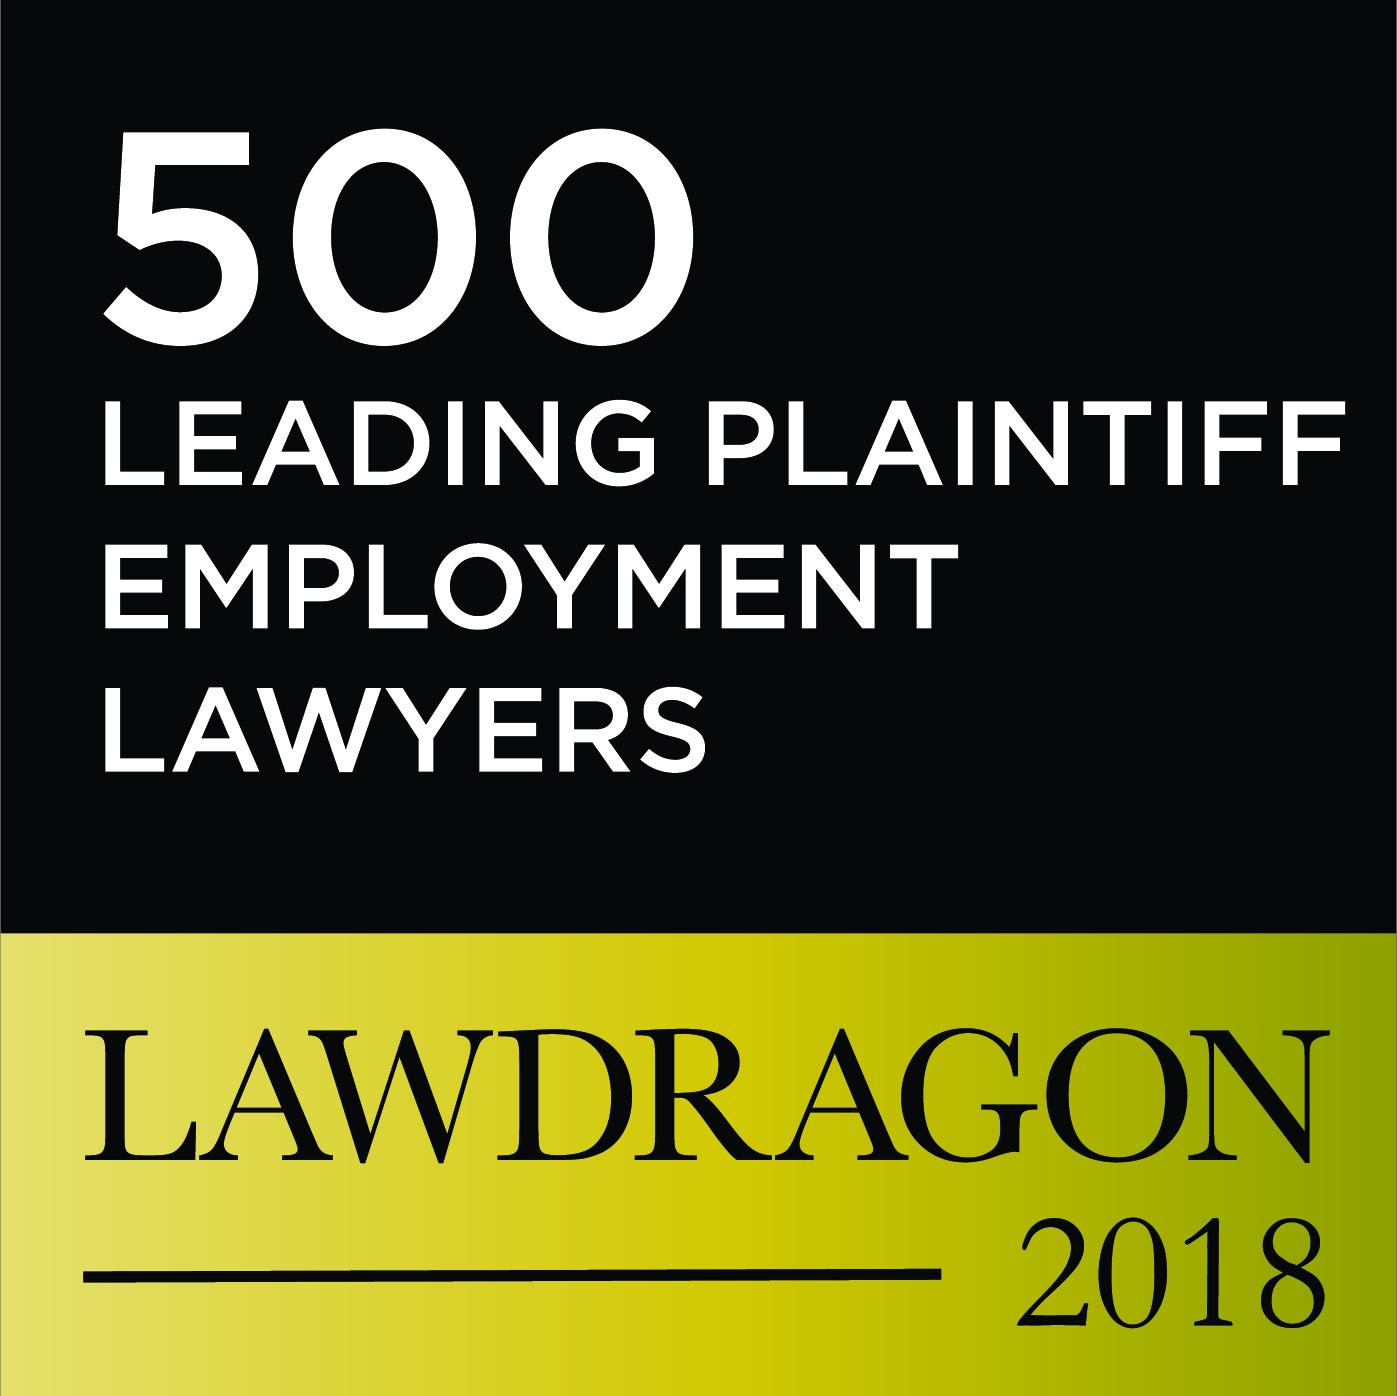 LD Plantiff Employment Lawyer.jpg